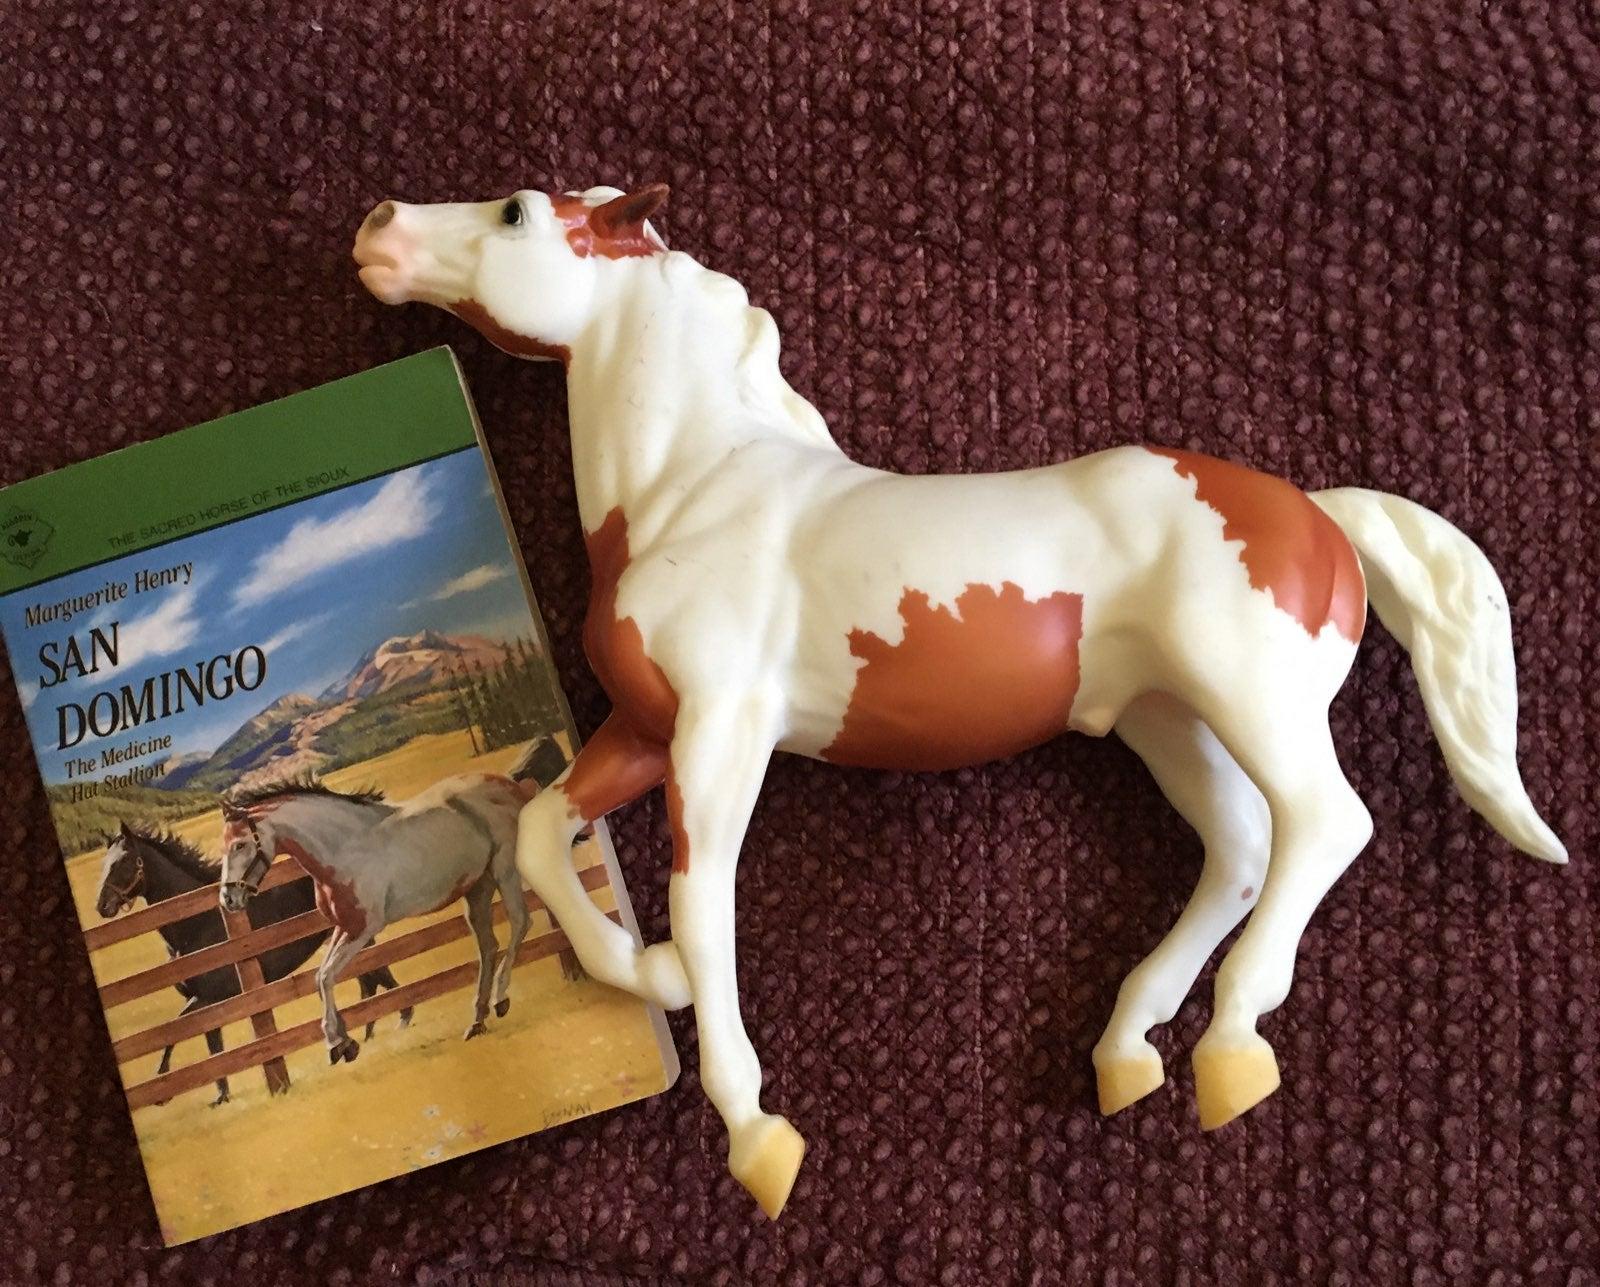 San Domingo The Medicine Stallion Book a